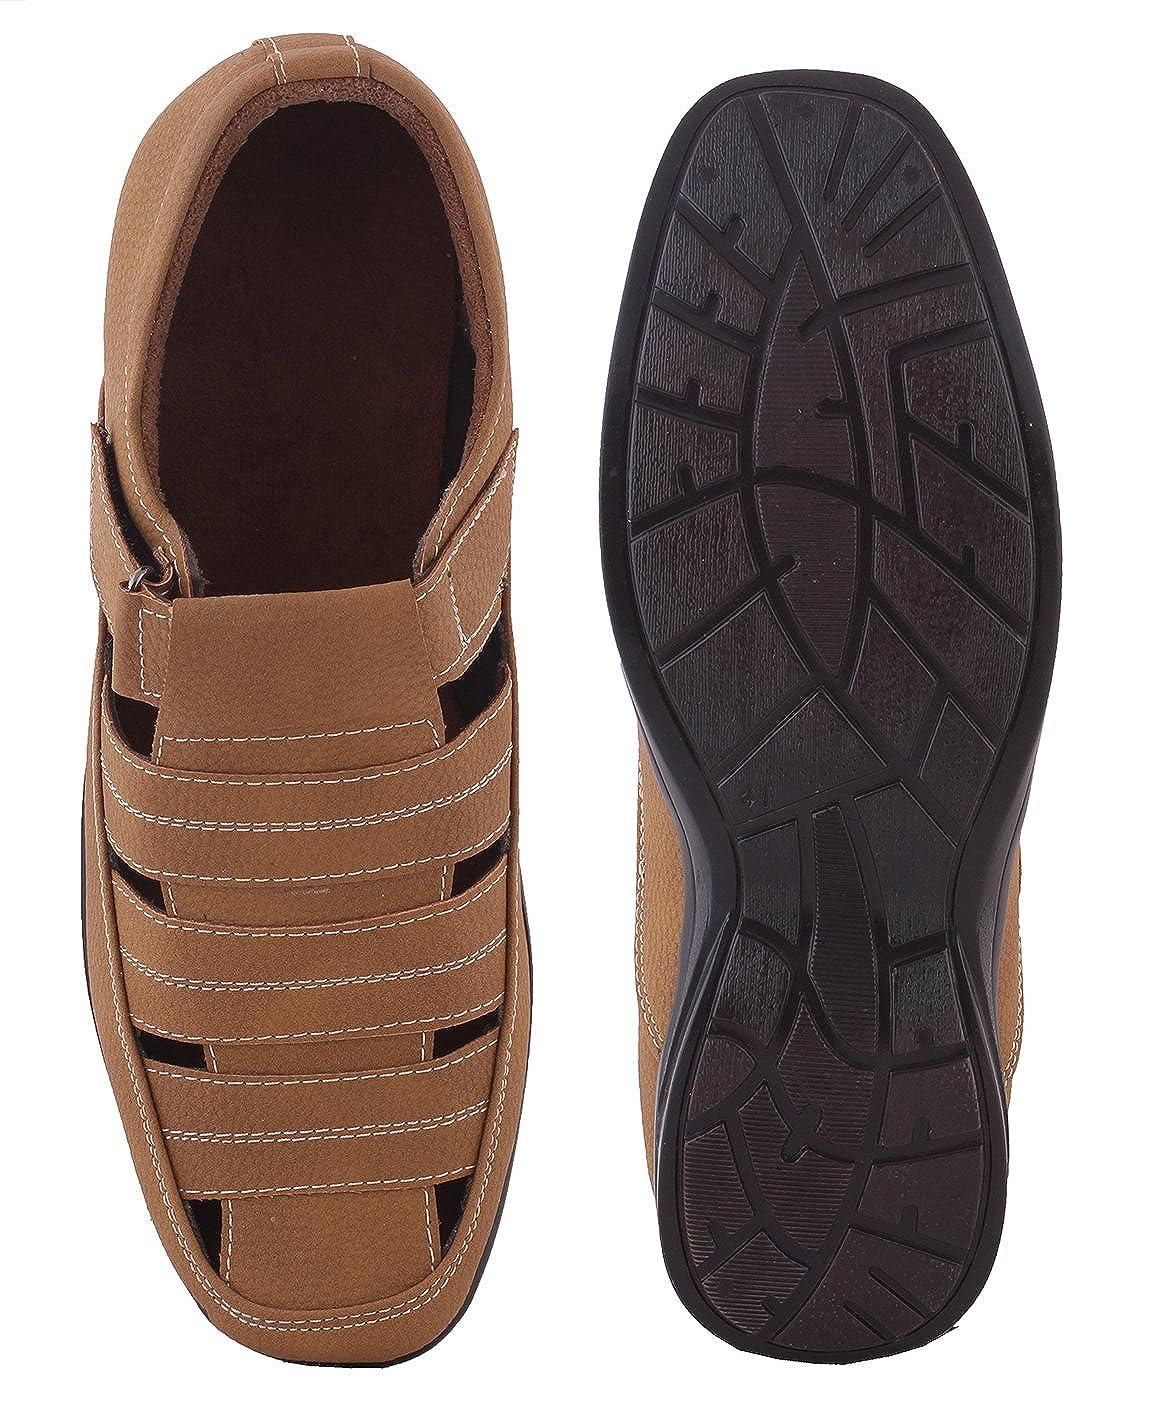 d415e50a1e91 WOODSTONE Men s Alberto Vereno Sandal  Buy Online at Low Prices in India -  Amazon.in